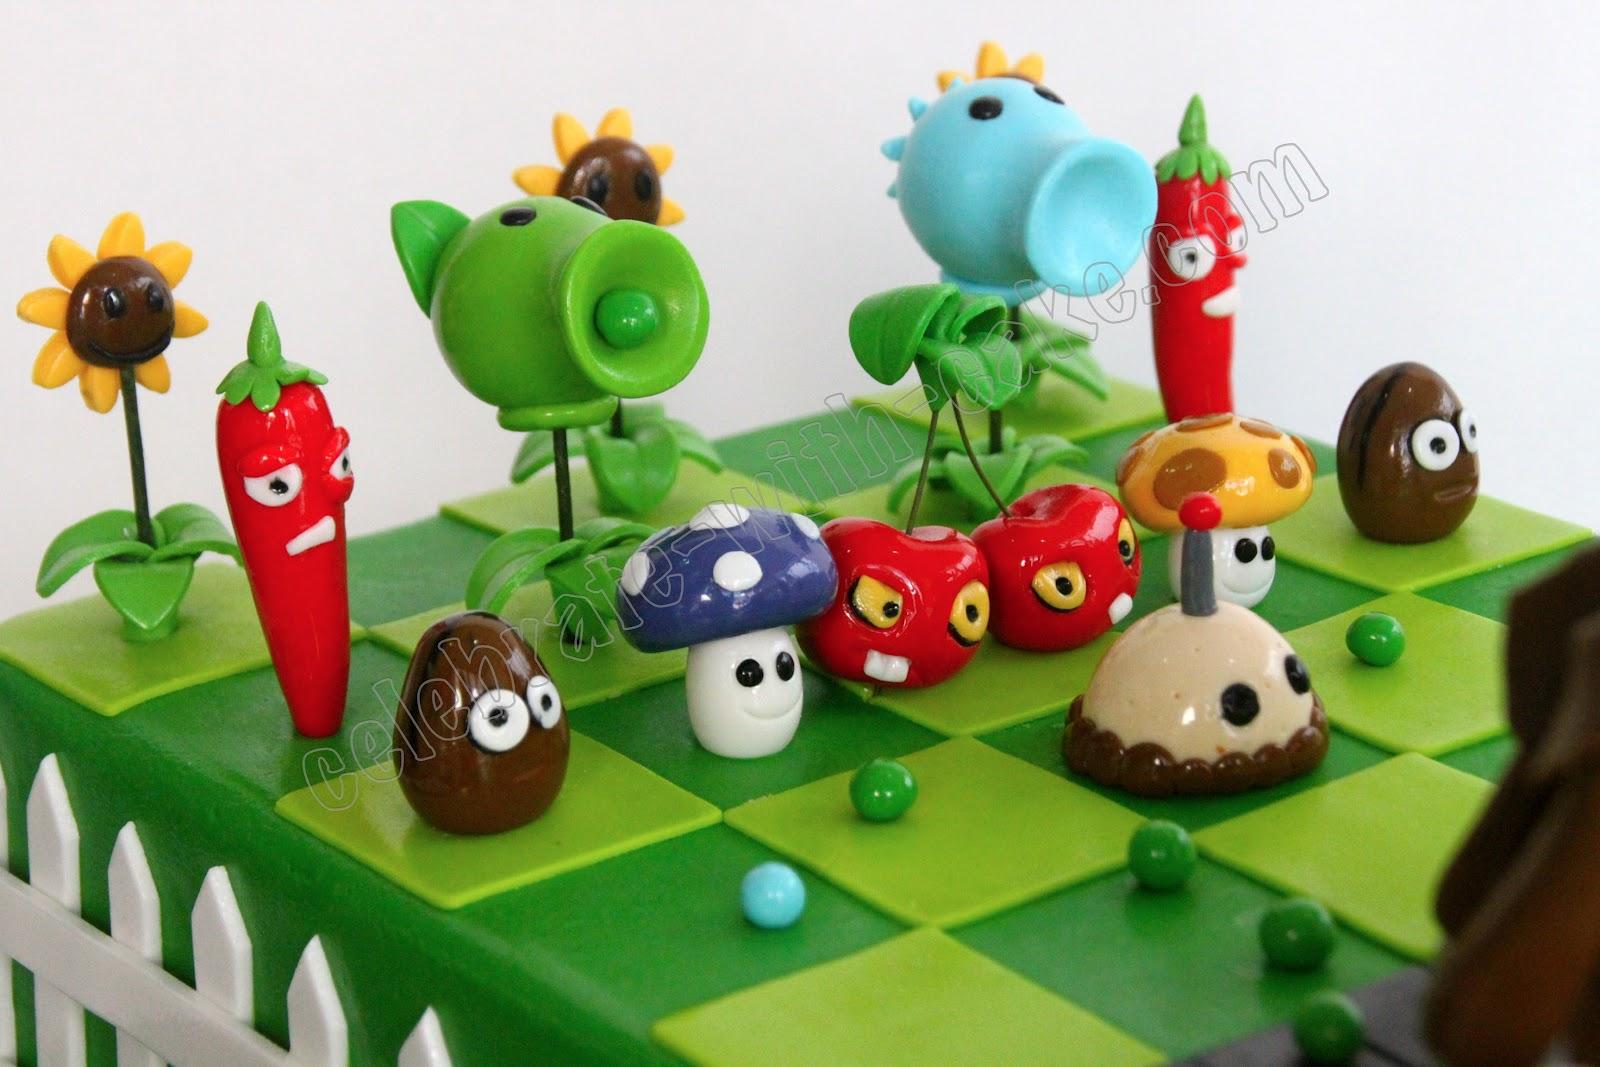 Plants Vs. Zombies Cake Supplies